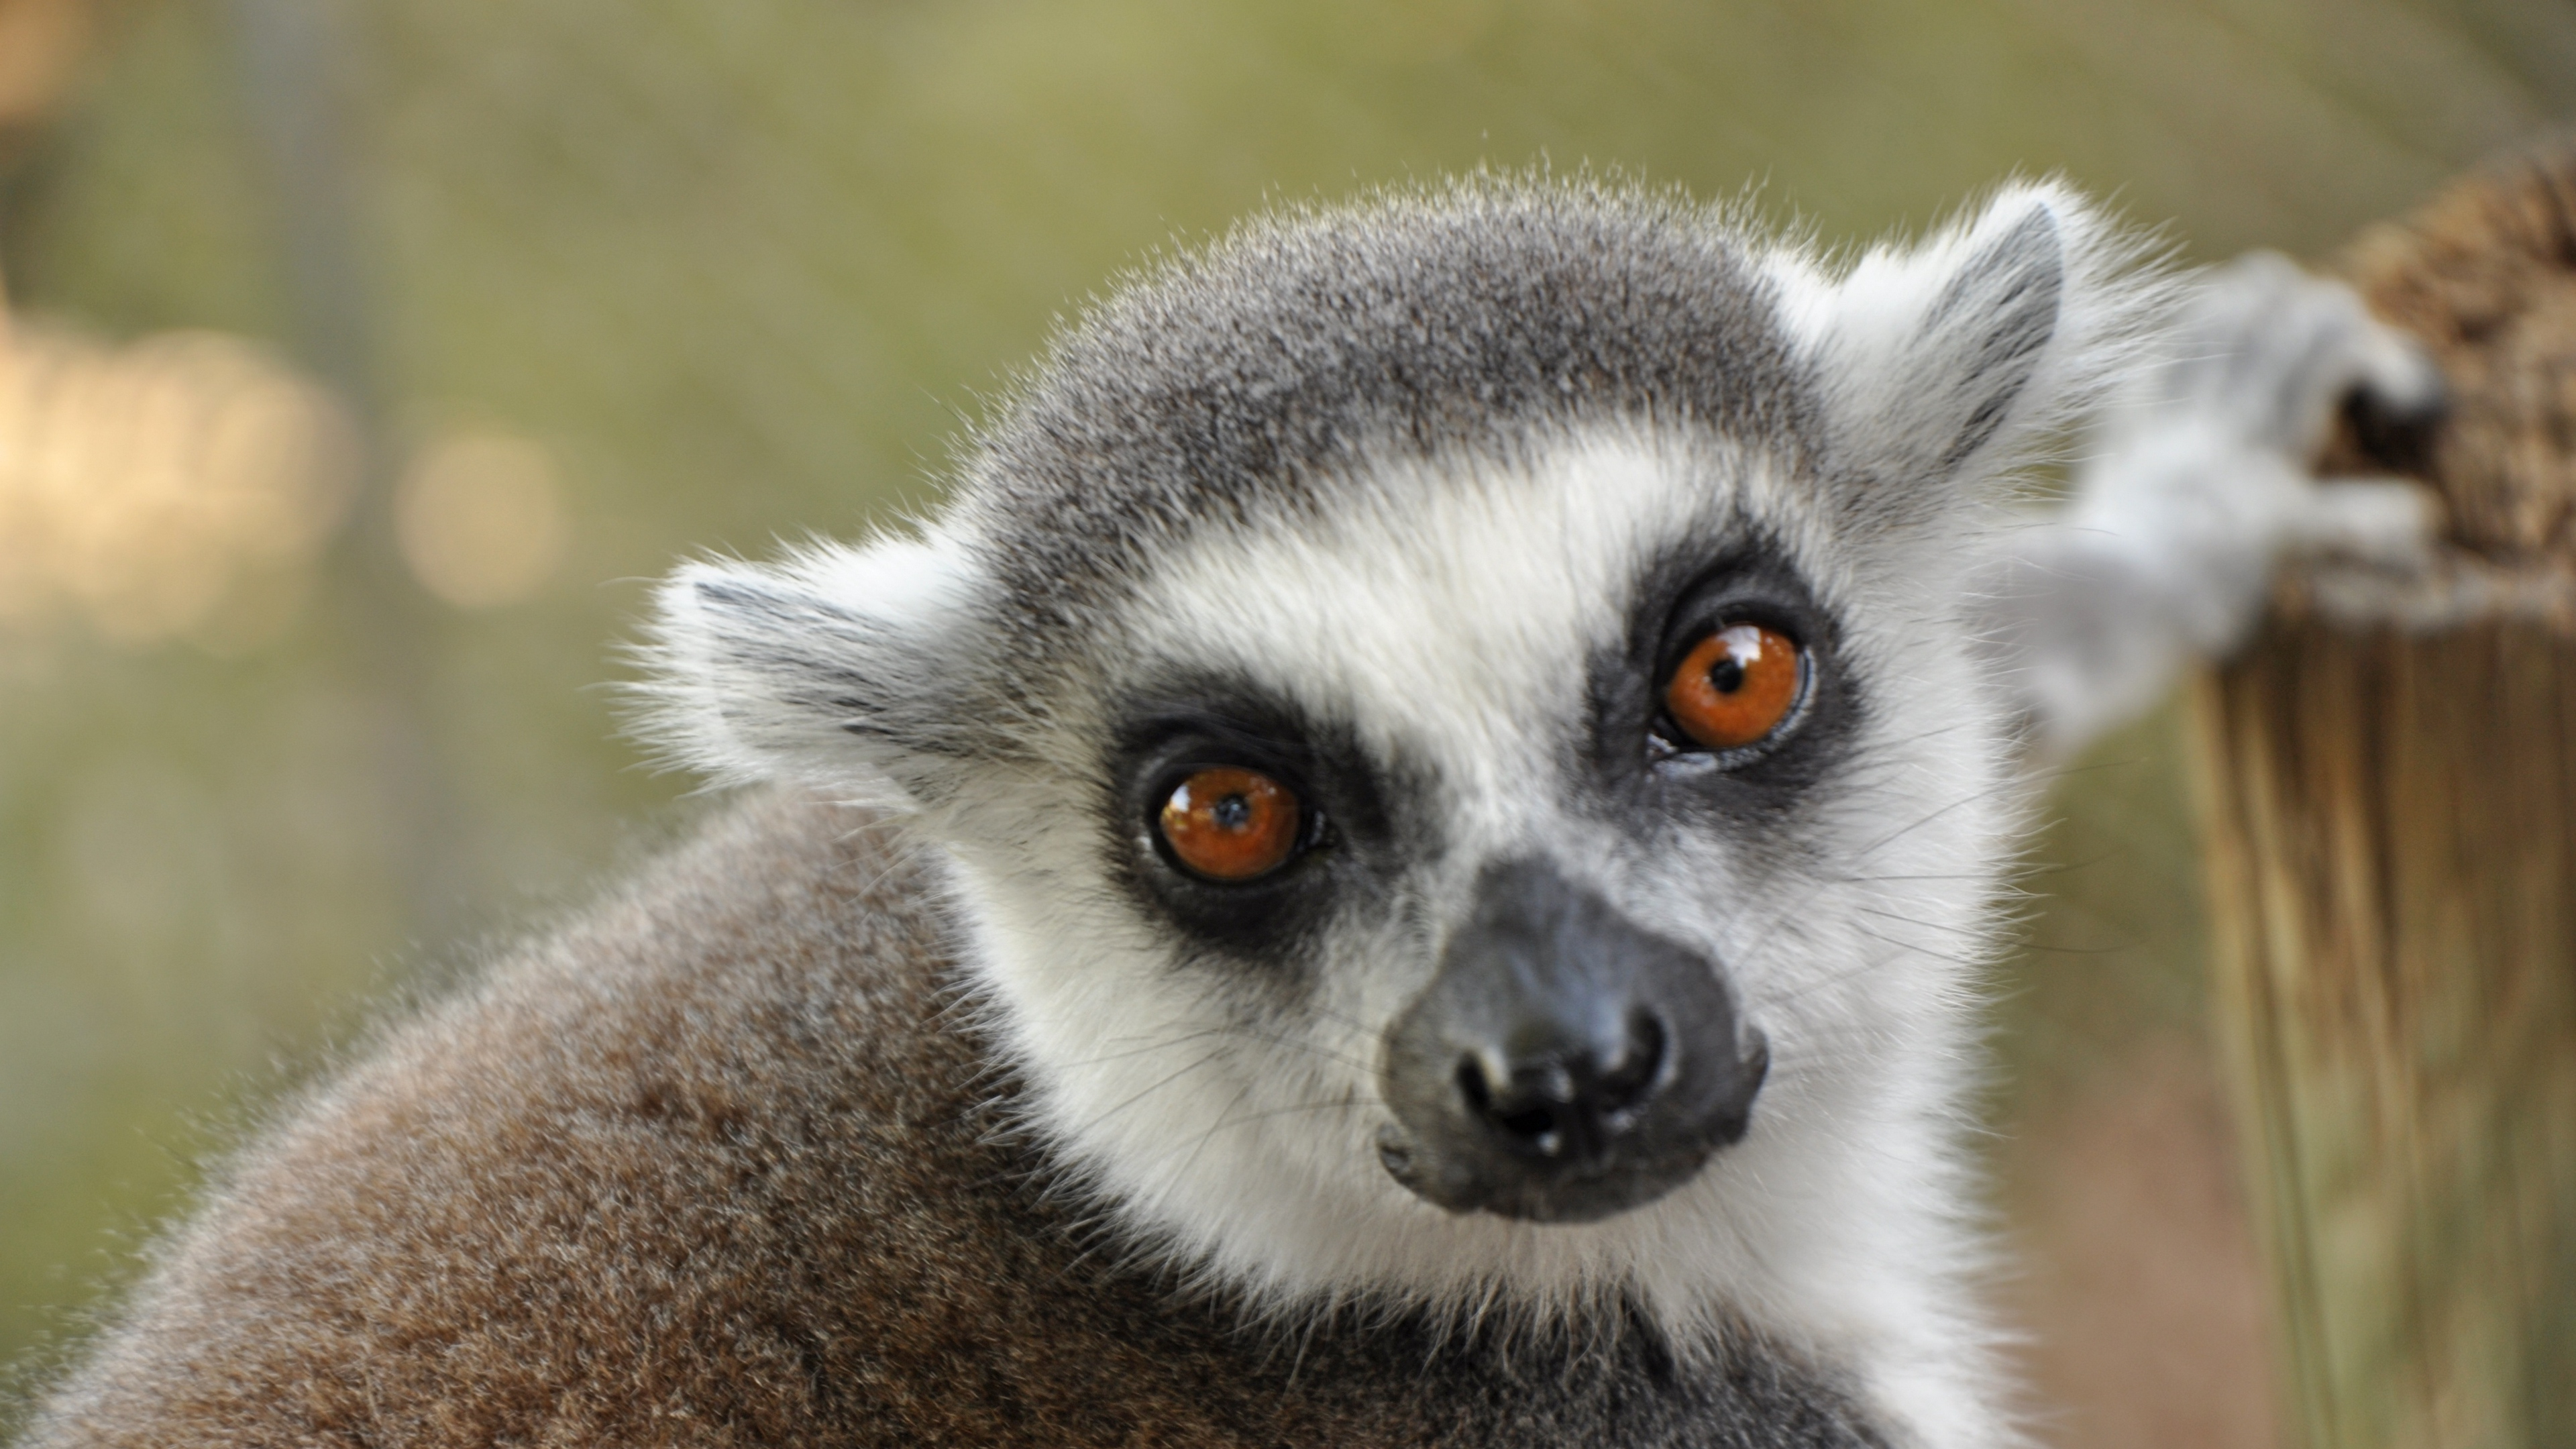 lemur muzzle eyes 4k 1542242730 - lemur, muzzle, eyes 4k - muzzle, lemur, Eyes